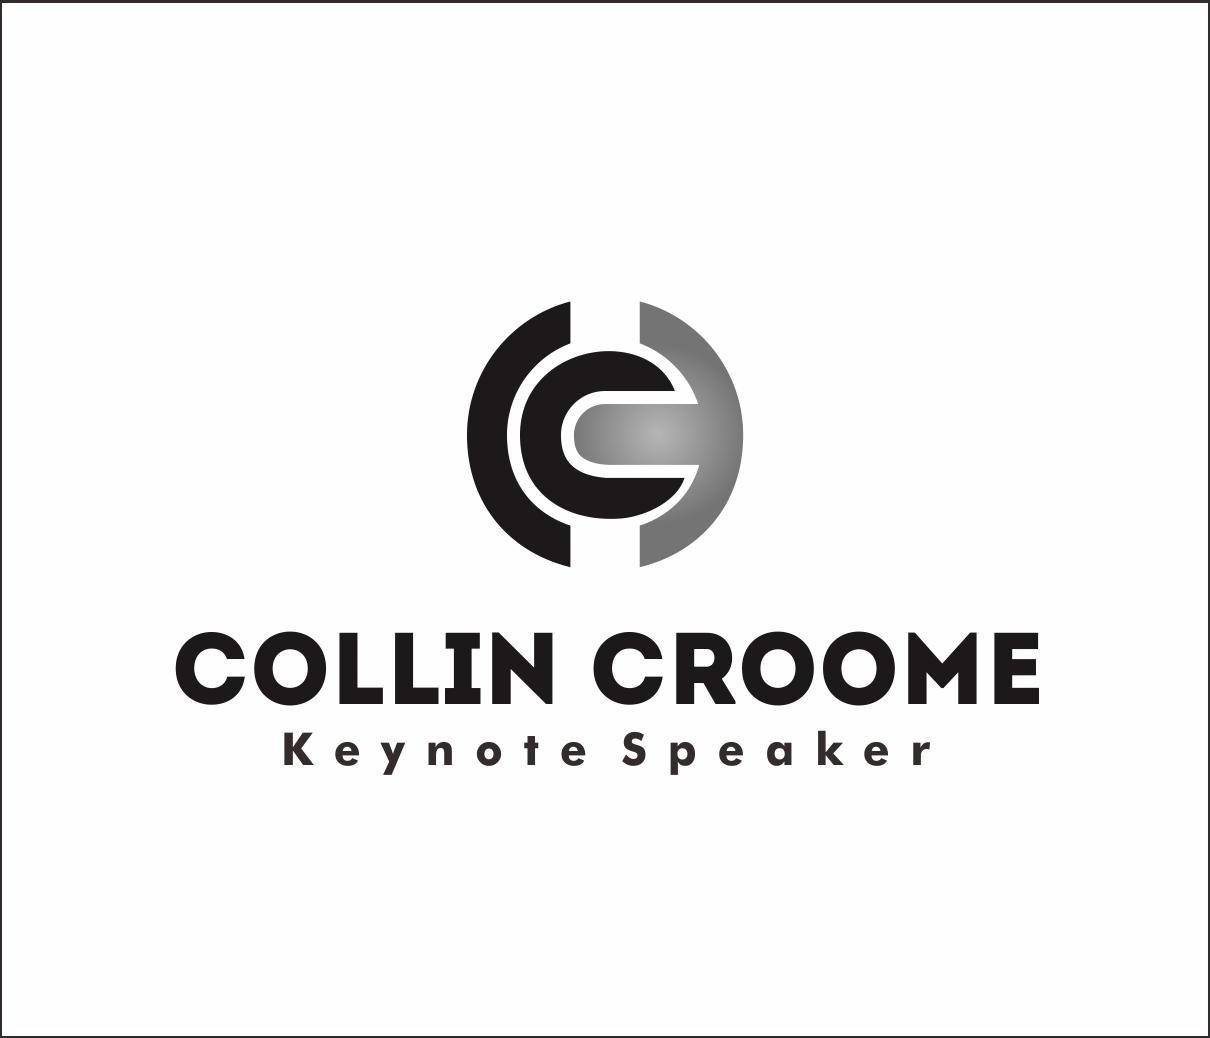 Logo Design by Armada Jamaluddin - Entry No. 158 in the Logo Design Contest Modern Logo Design for Collin Croome.